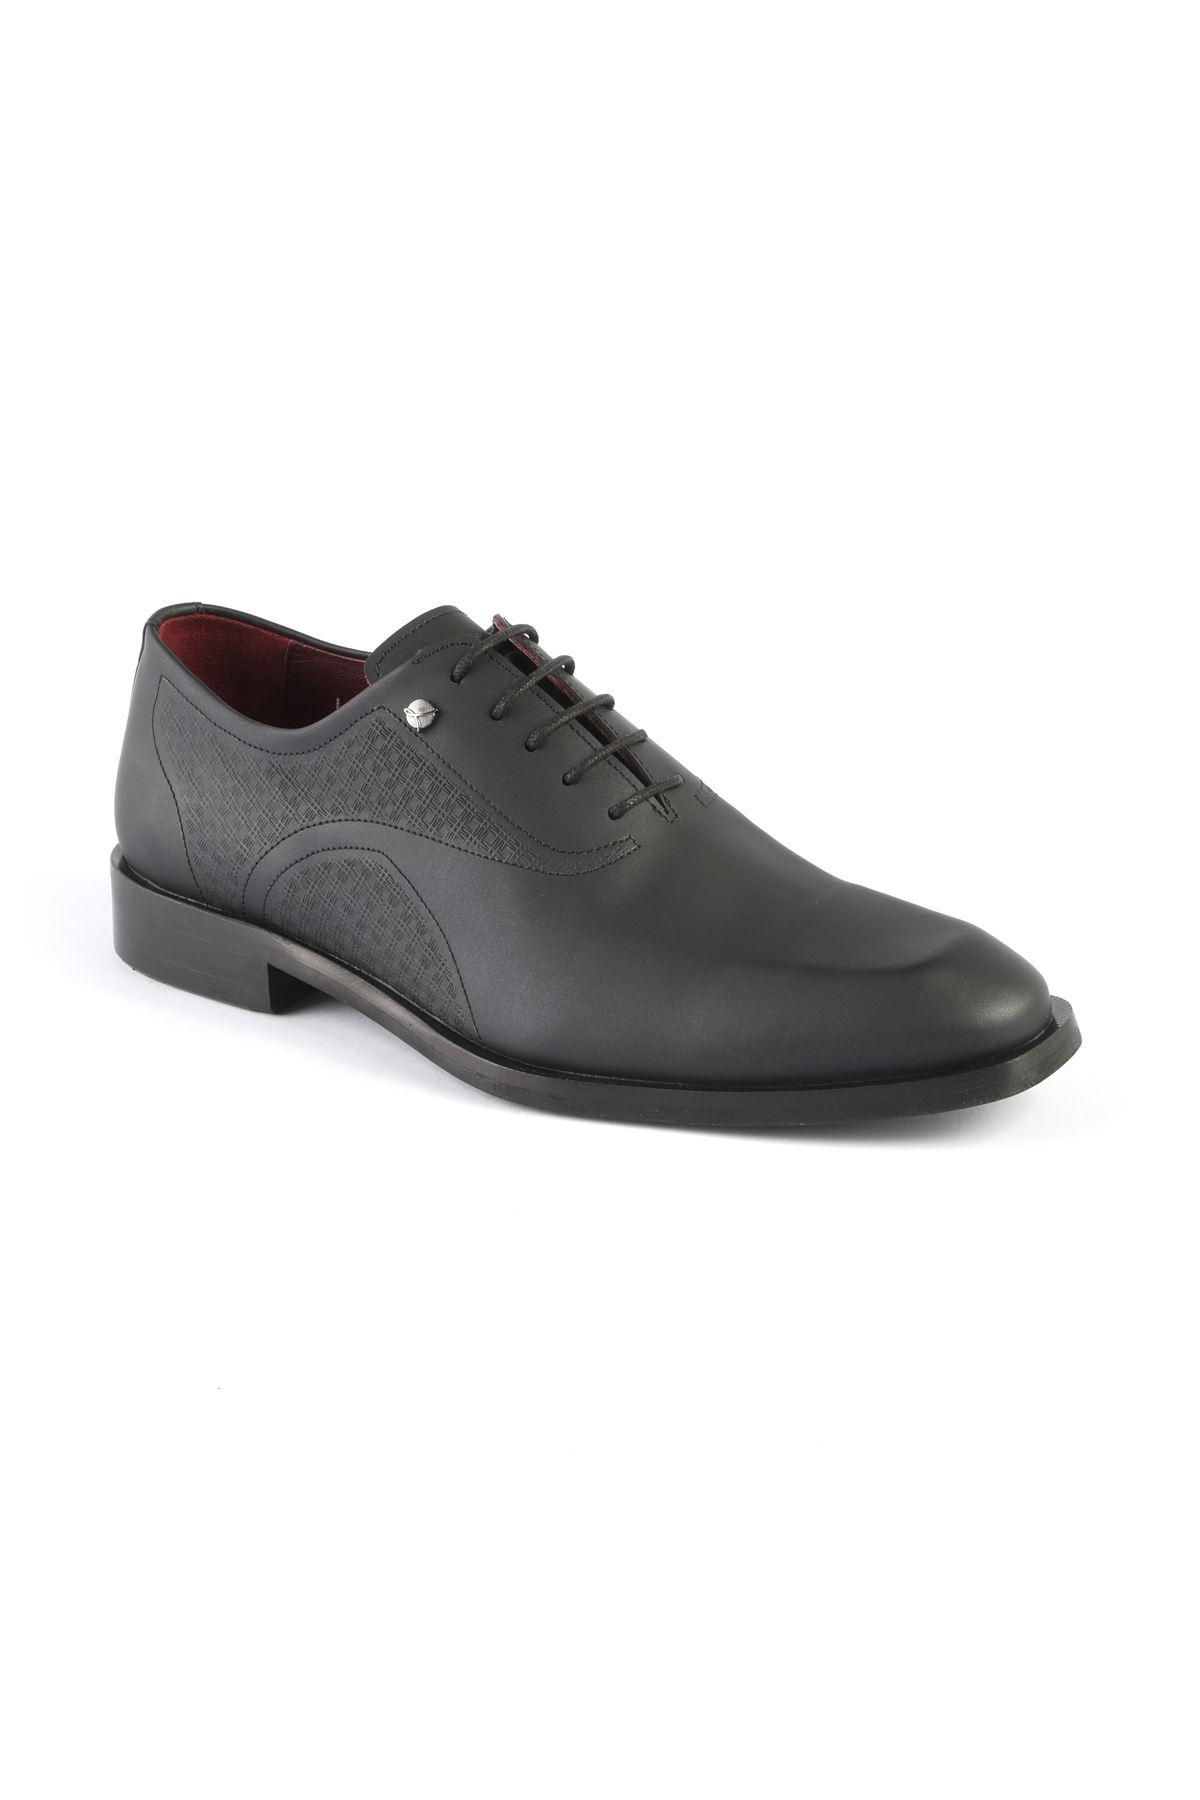 Libero 3253 Black Classic Shoes